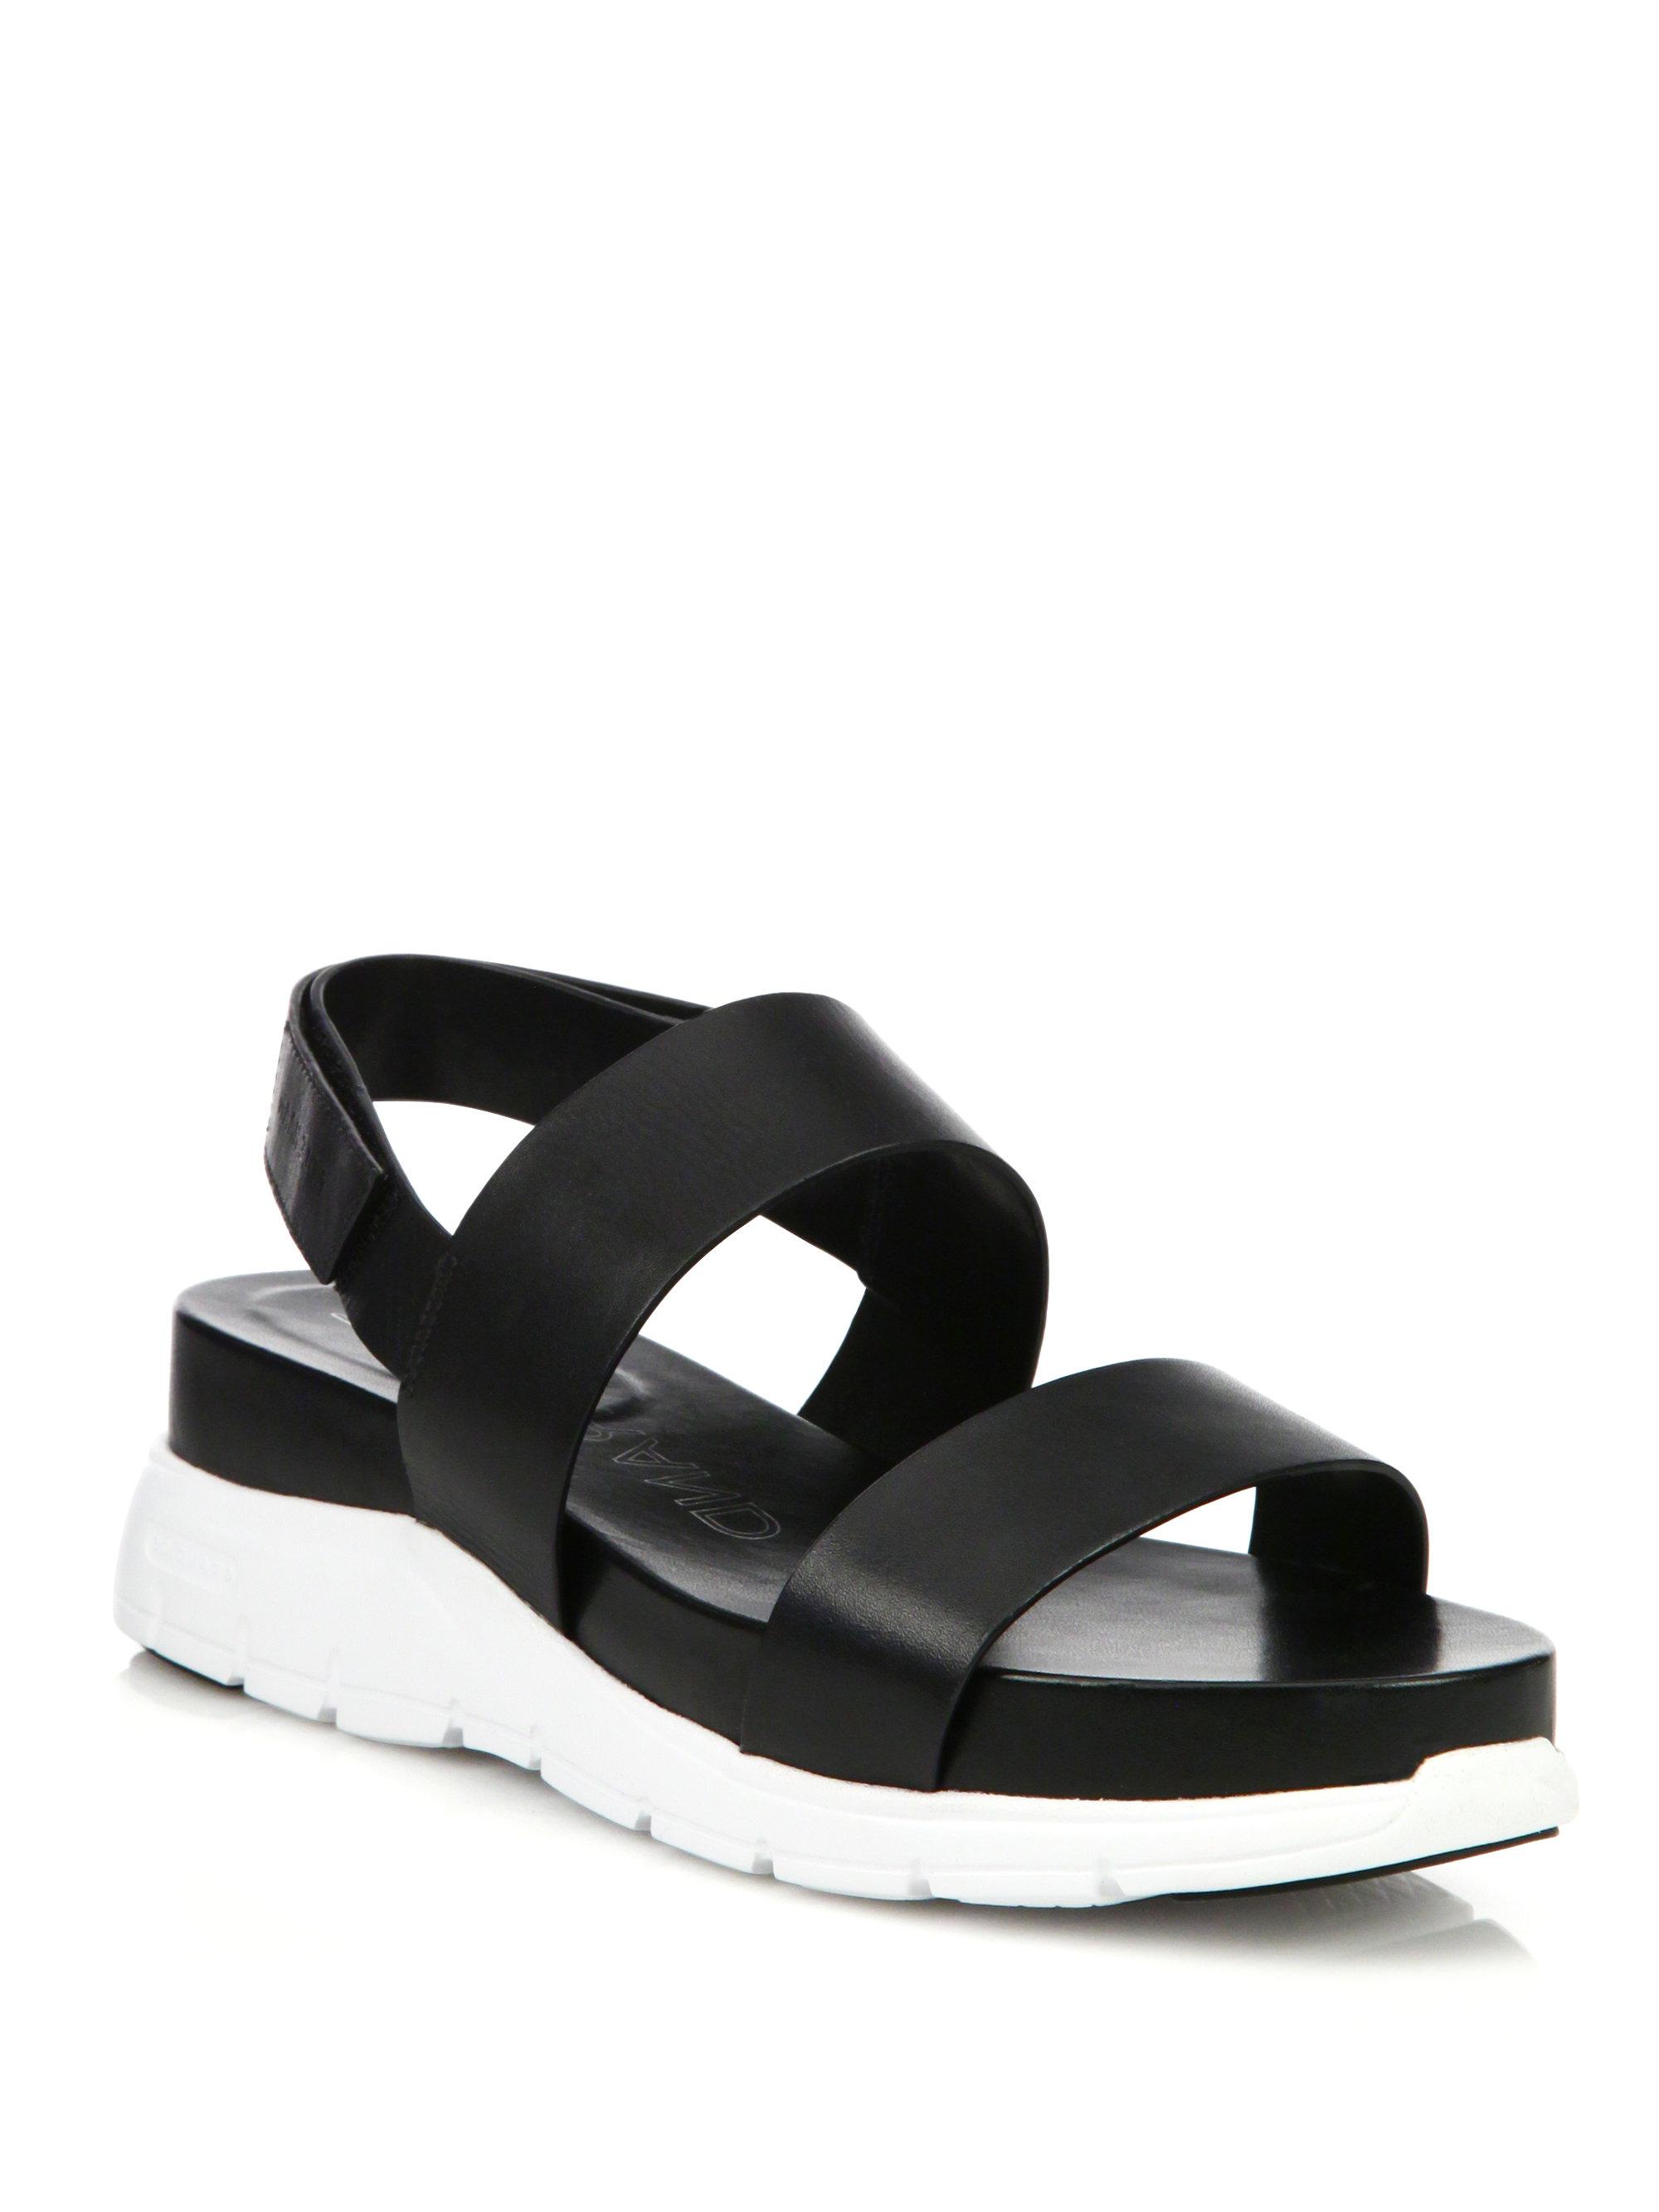 3614f44c619c Lyst - Cole Haan Zerogrand Leather Platform Slingback Sandals in Black